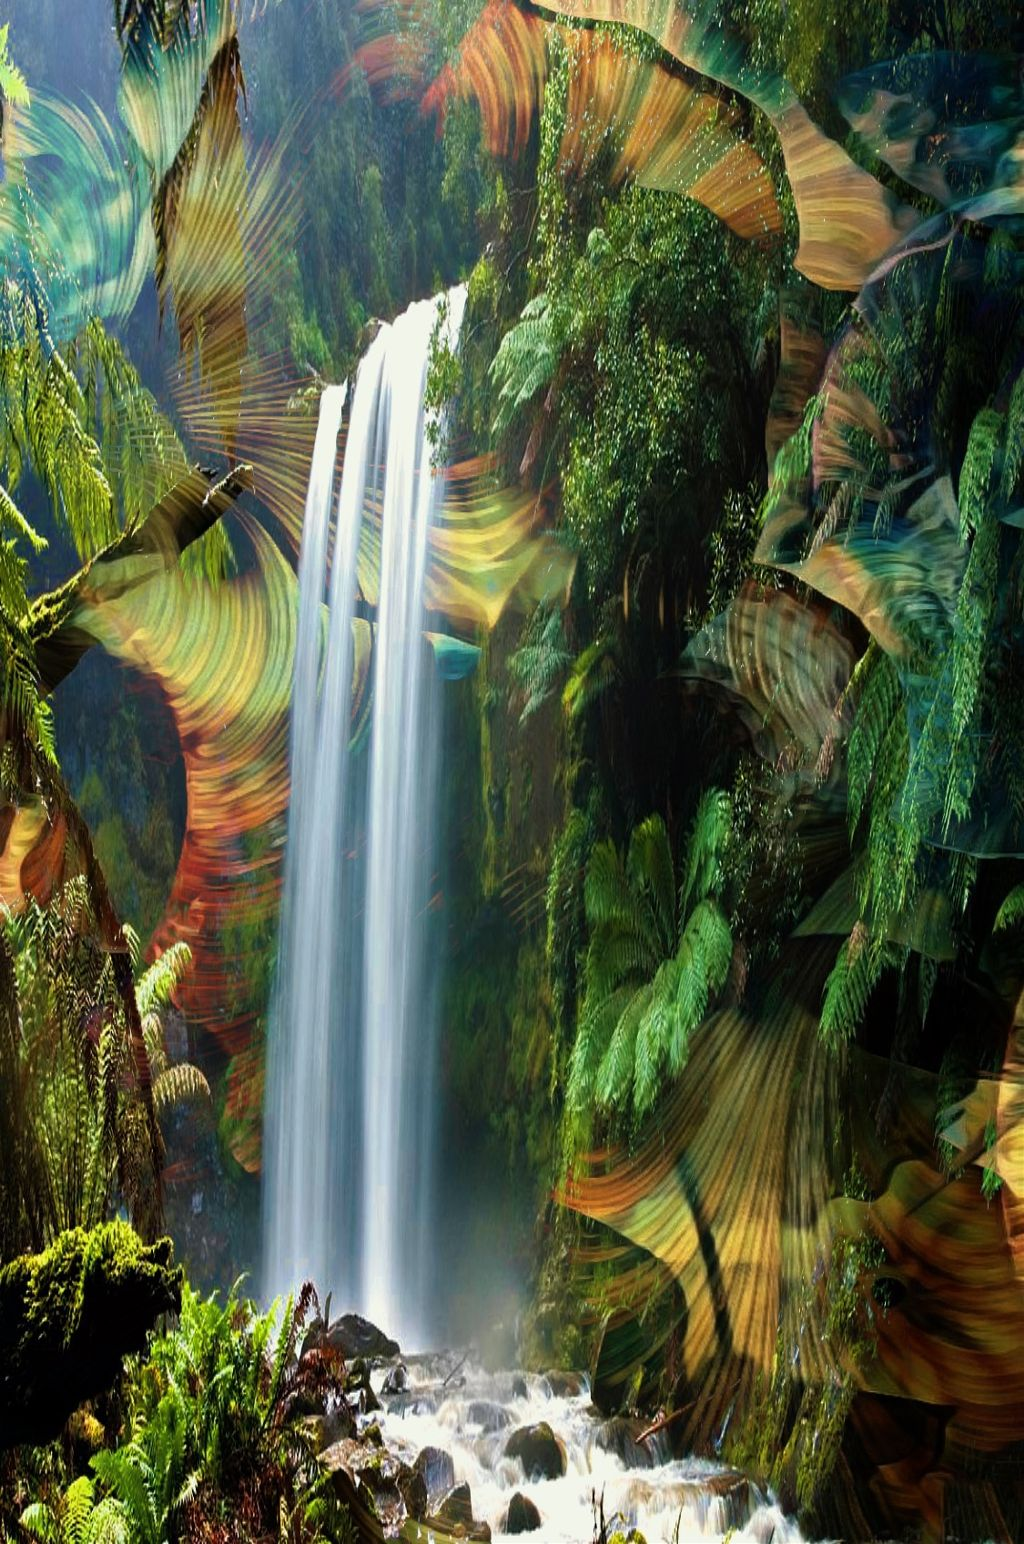 Mystic Moments                                                             #remix #freetoedit #doubleexsposure #paredit